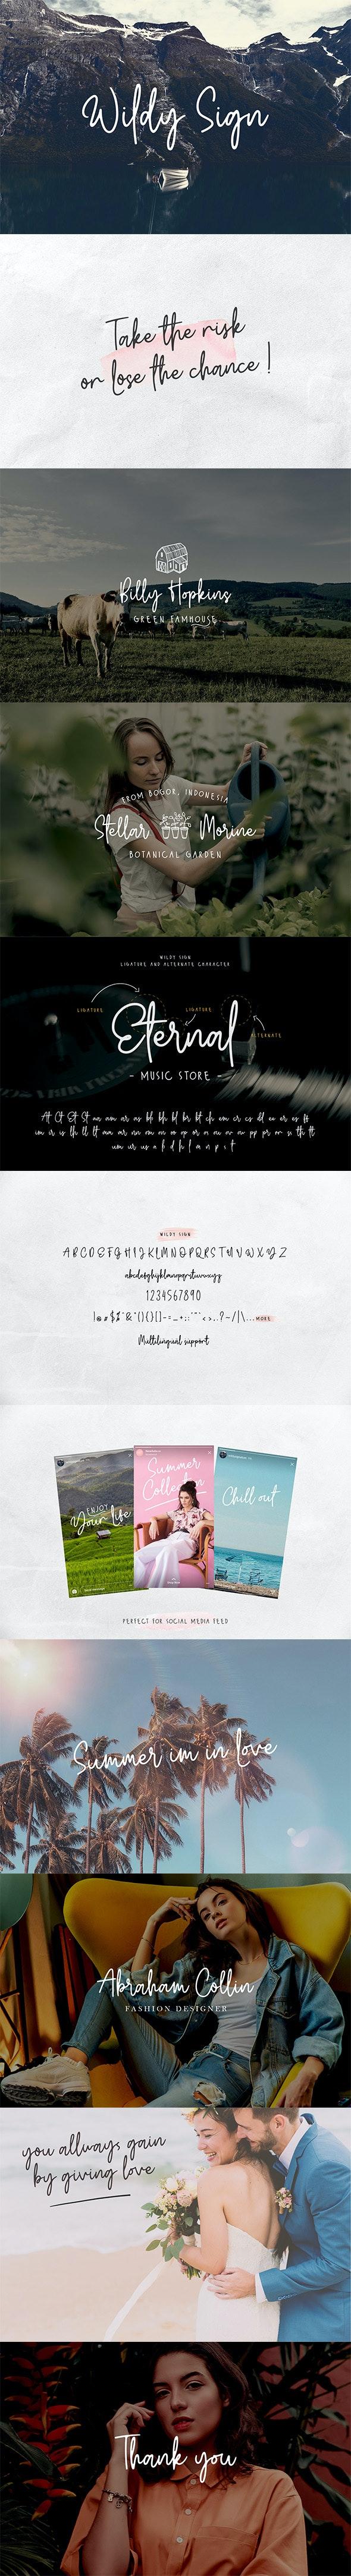 Wildy Sign - Hand-writing Script